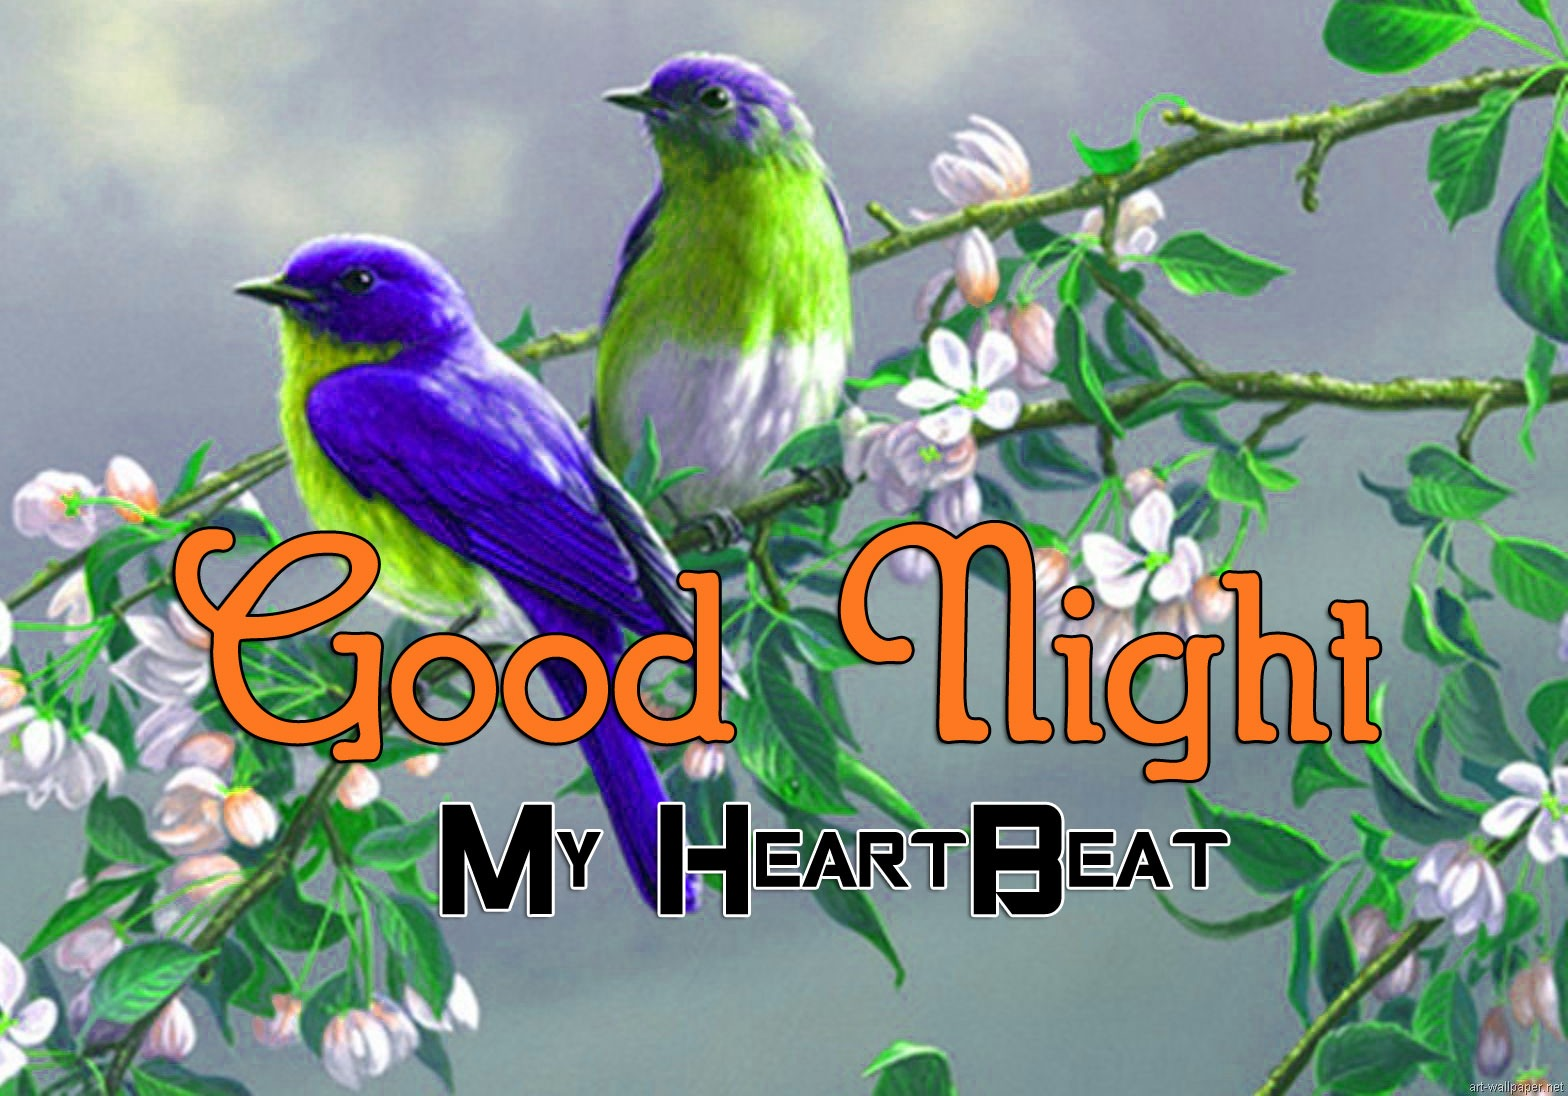 Bird Girlfriend Good Night Wishes Images